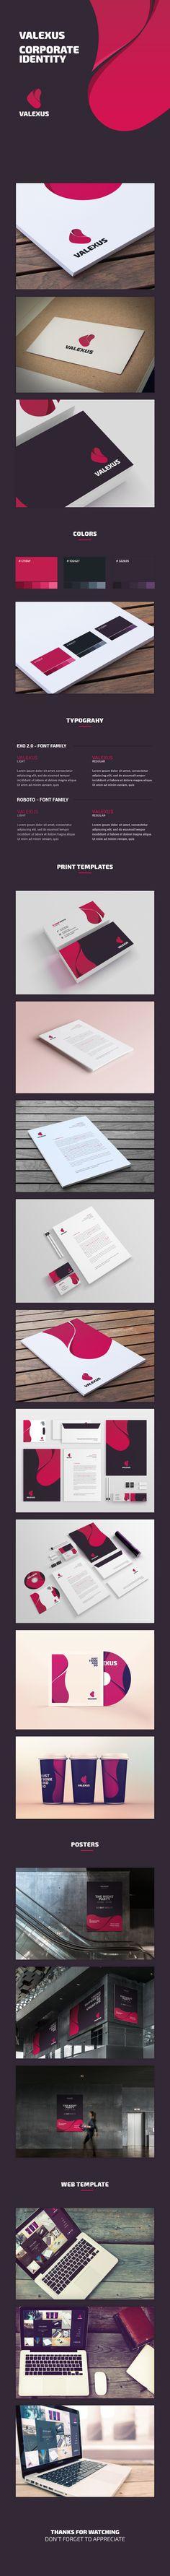 Valexus - Corporate Identity and Branding on Behance